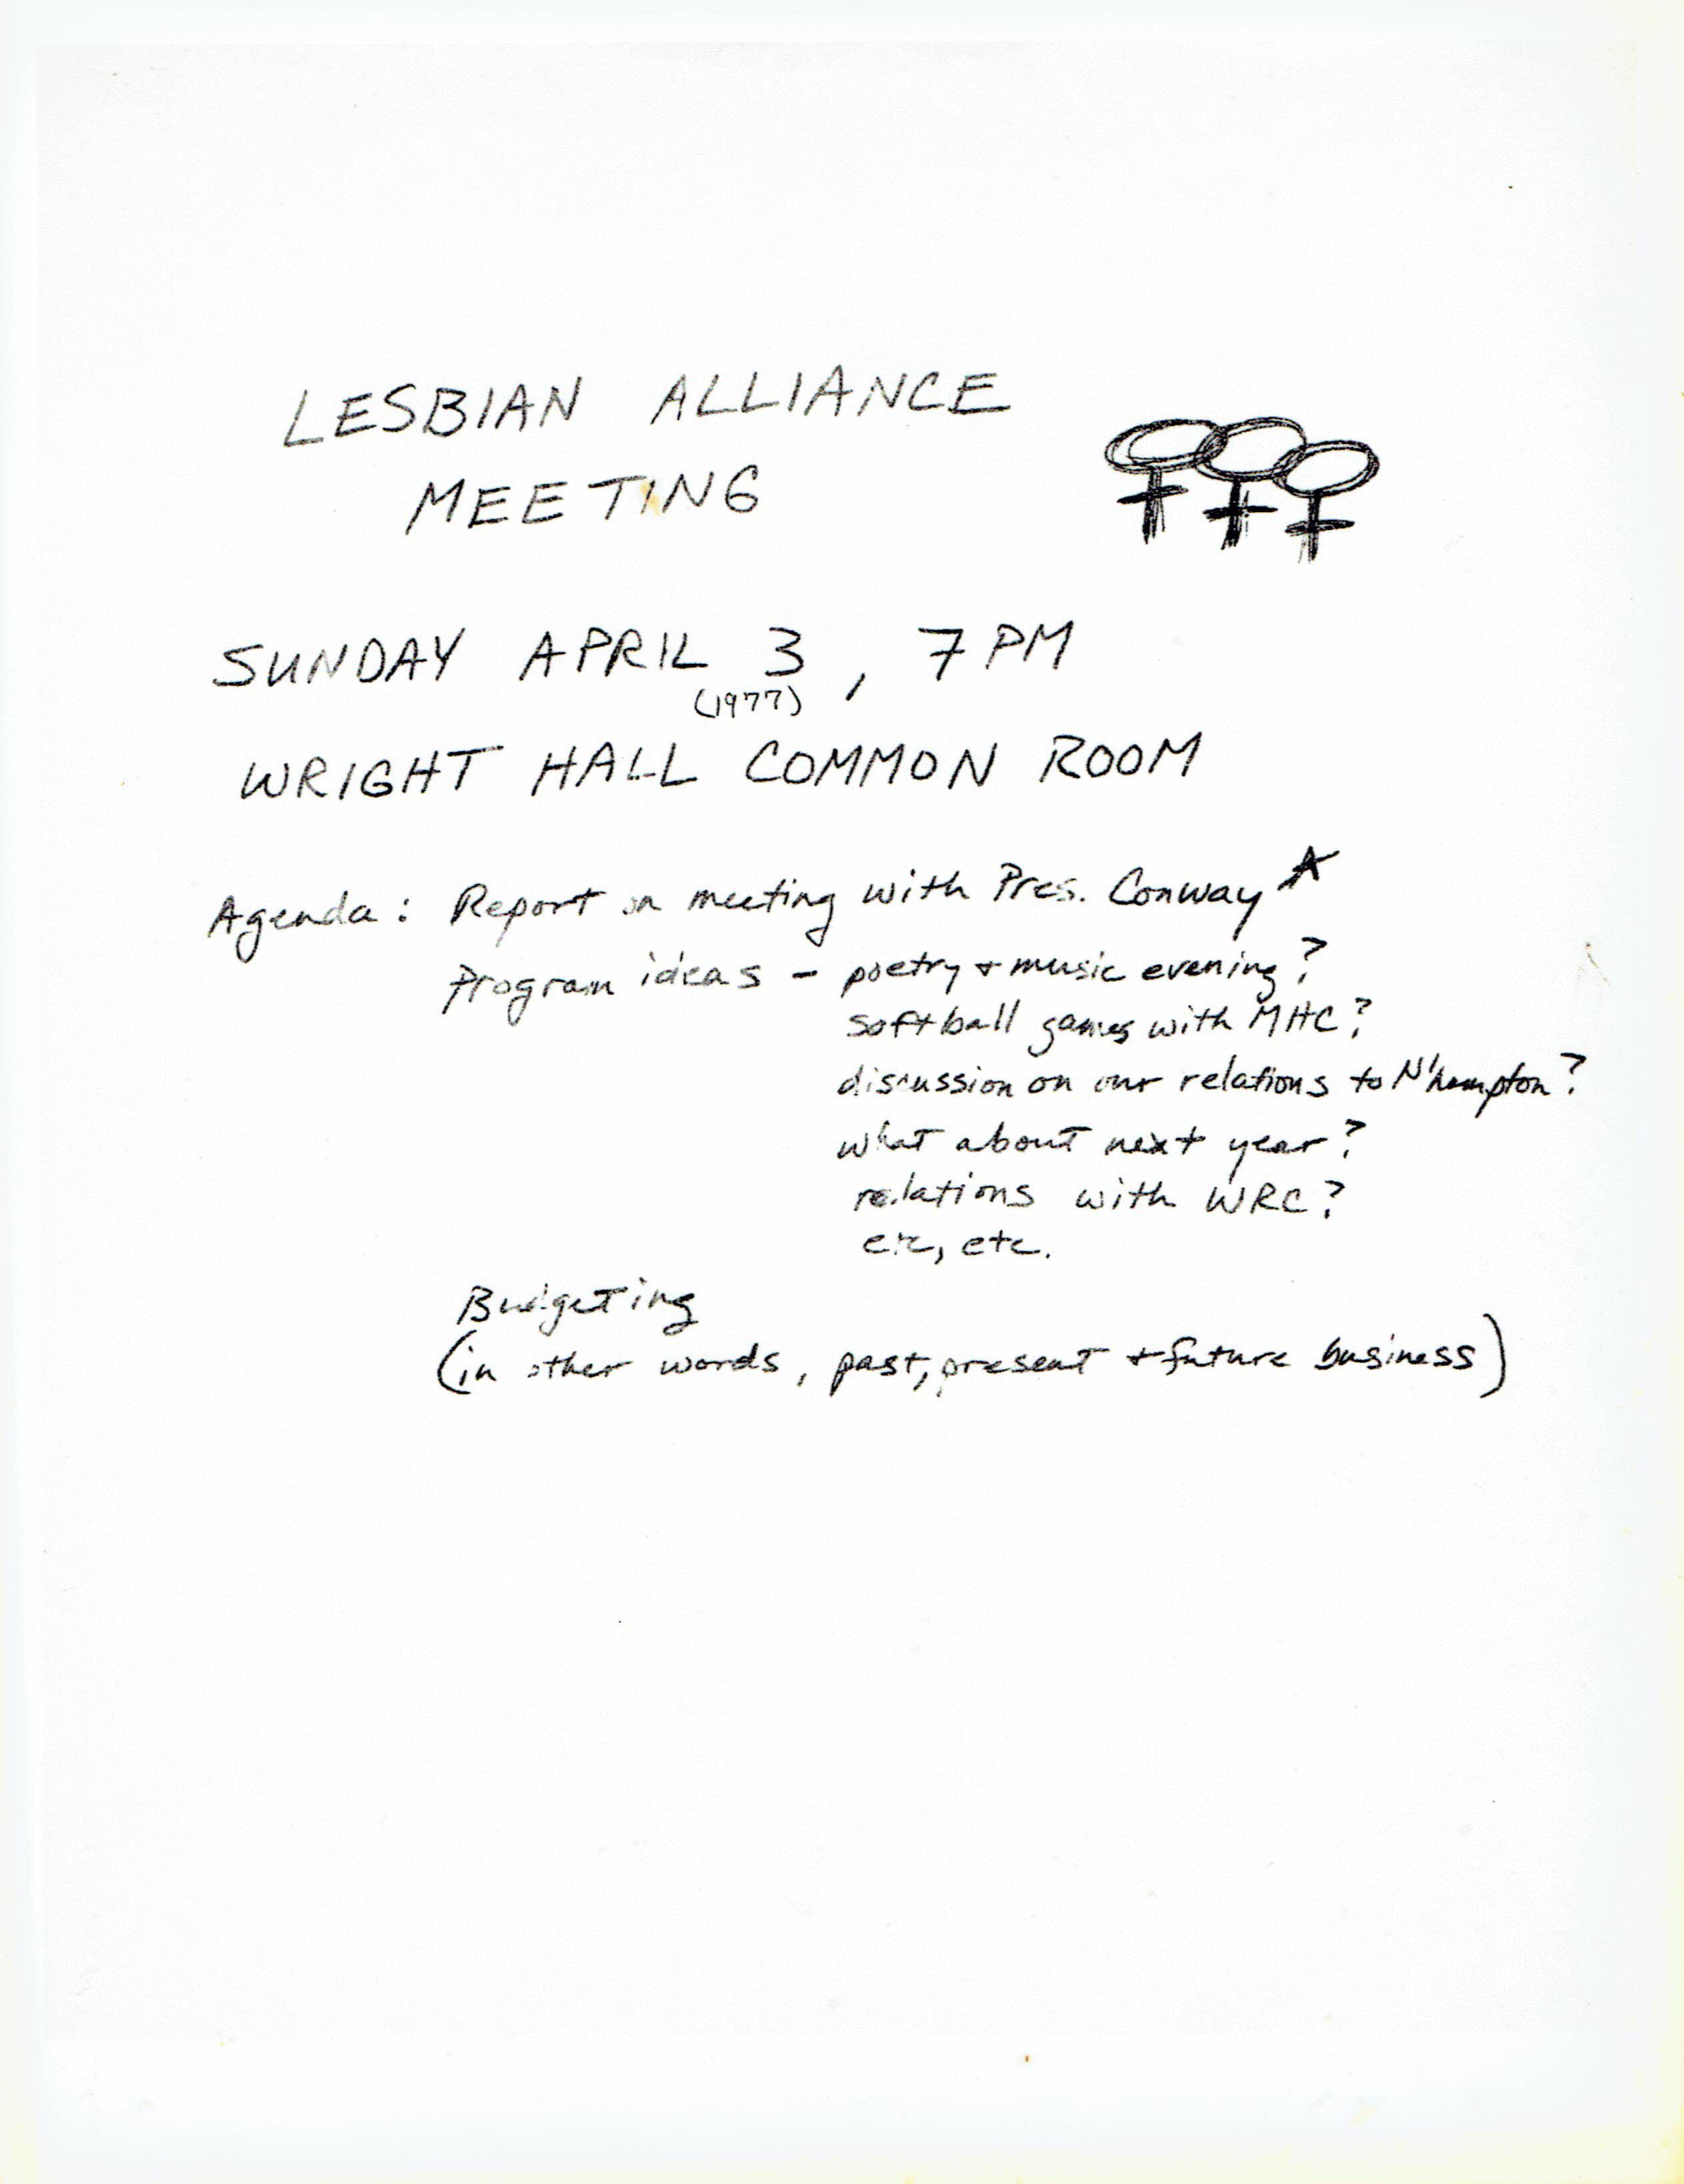 scla apr3 77 flyer w mtg agenda, scarchives_edited-1